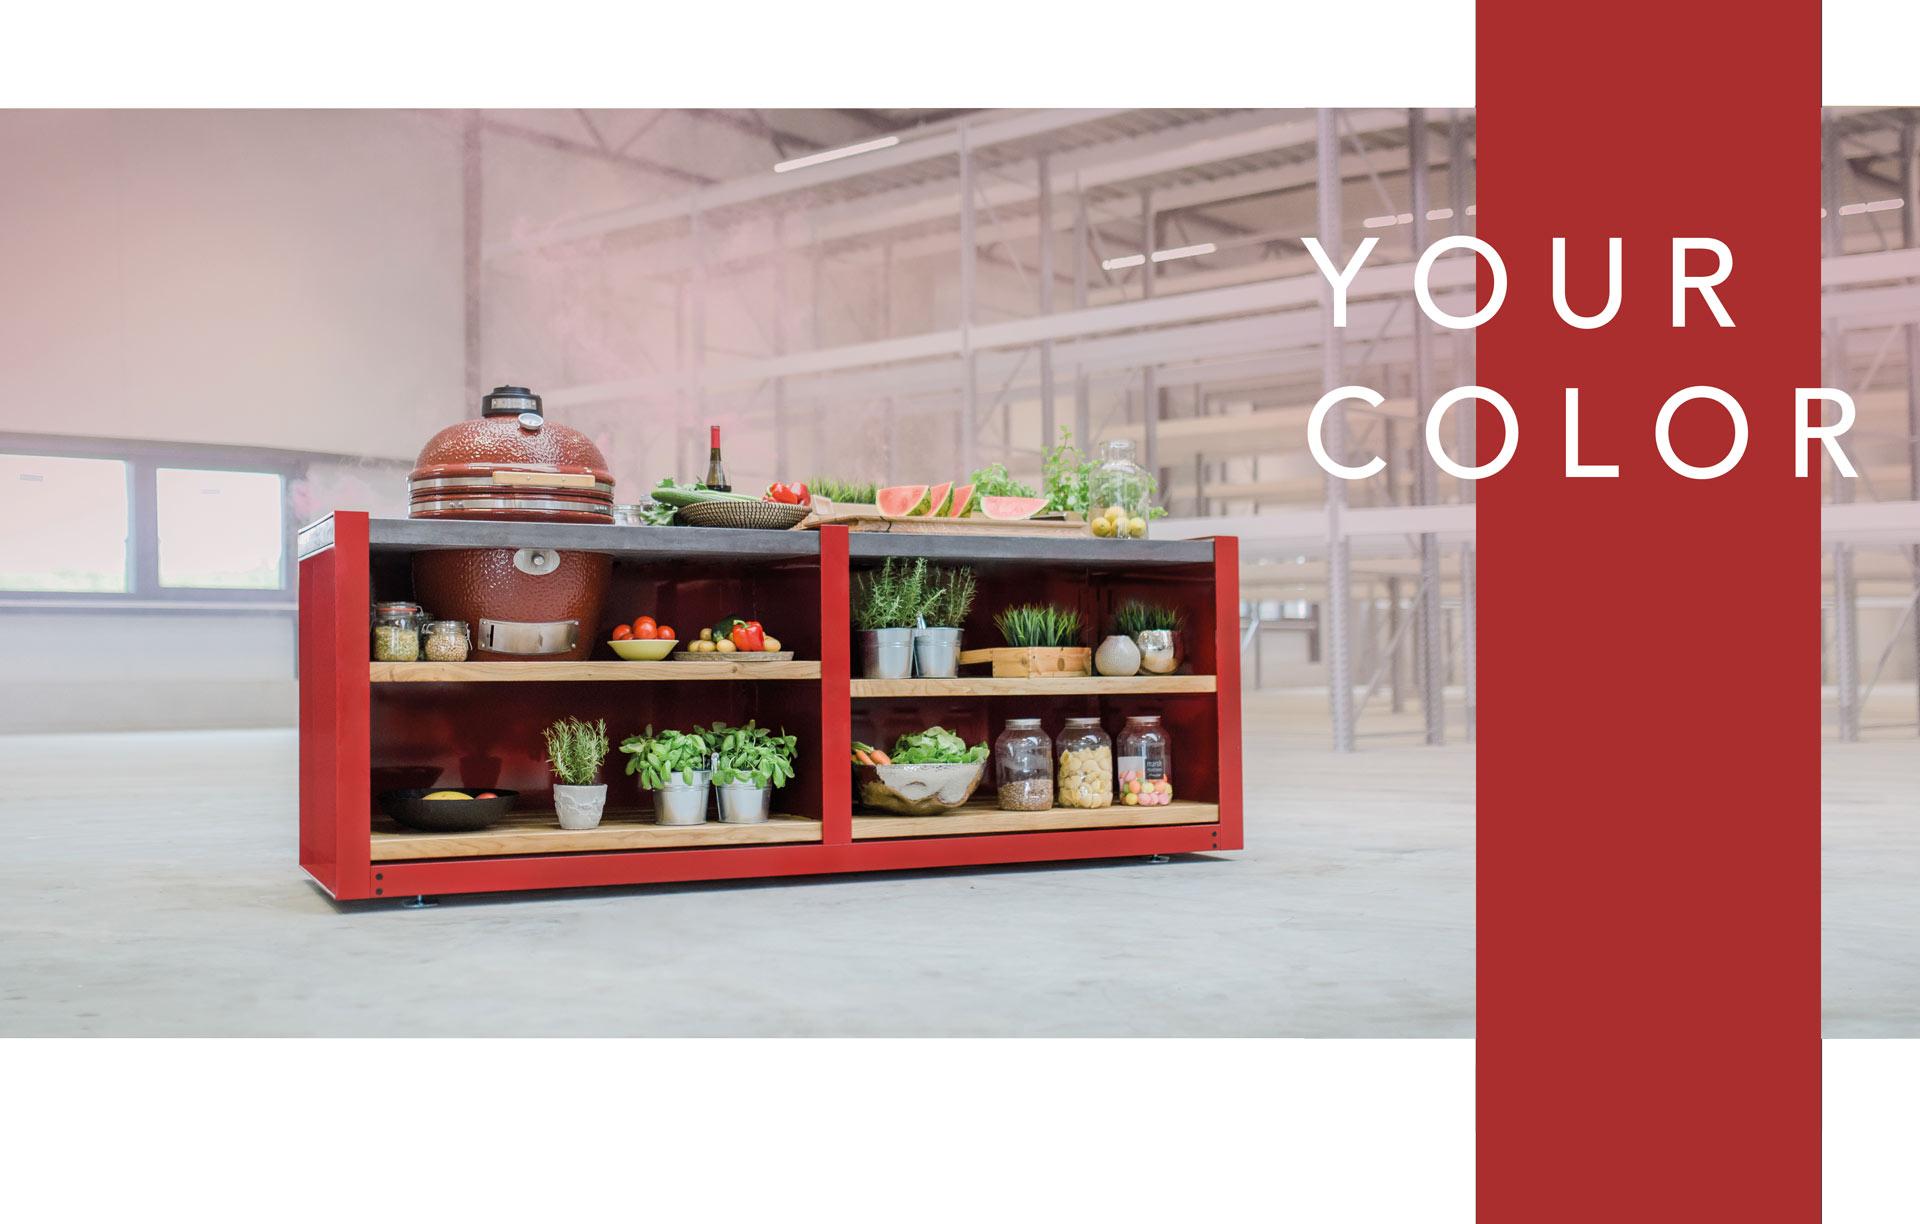 Oehler-Outdoor-kitchen-zeit-ist-luxus-color-red-color.jpg